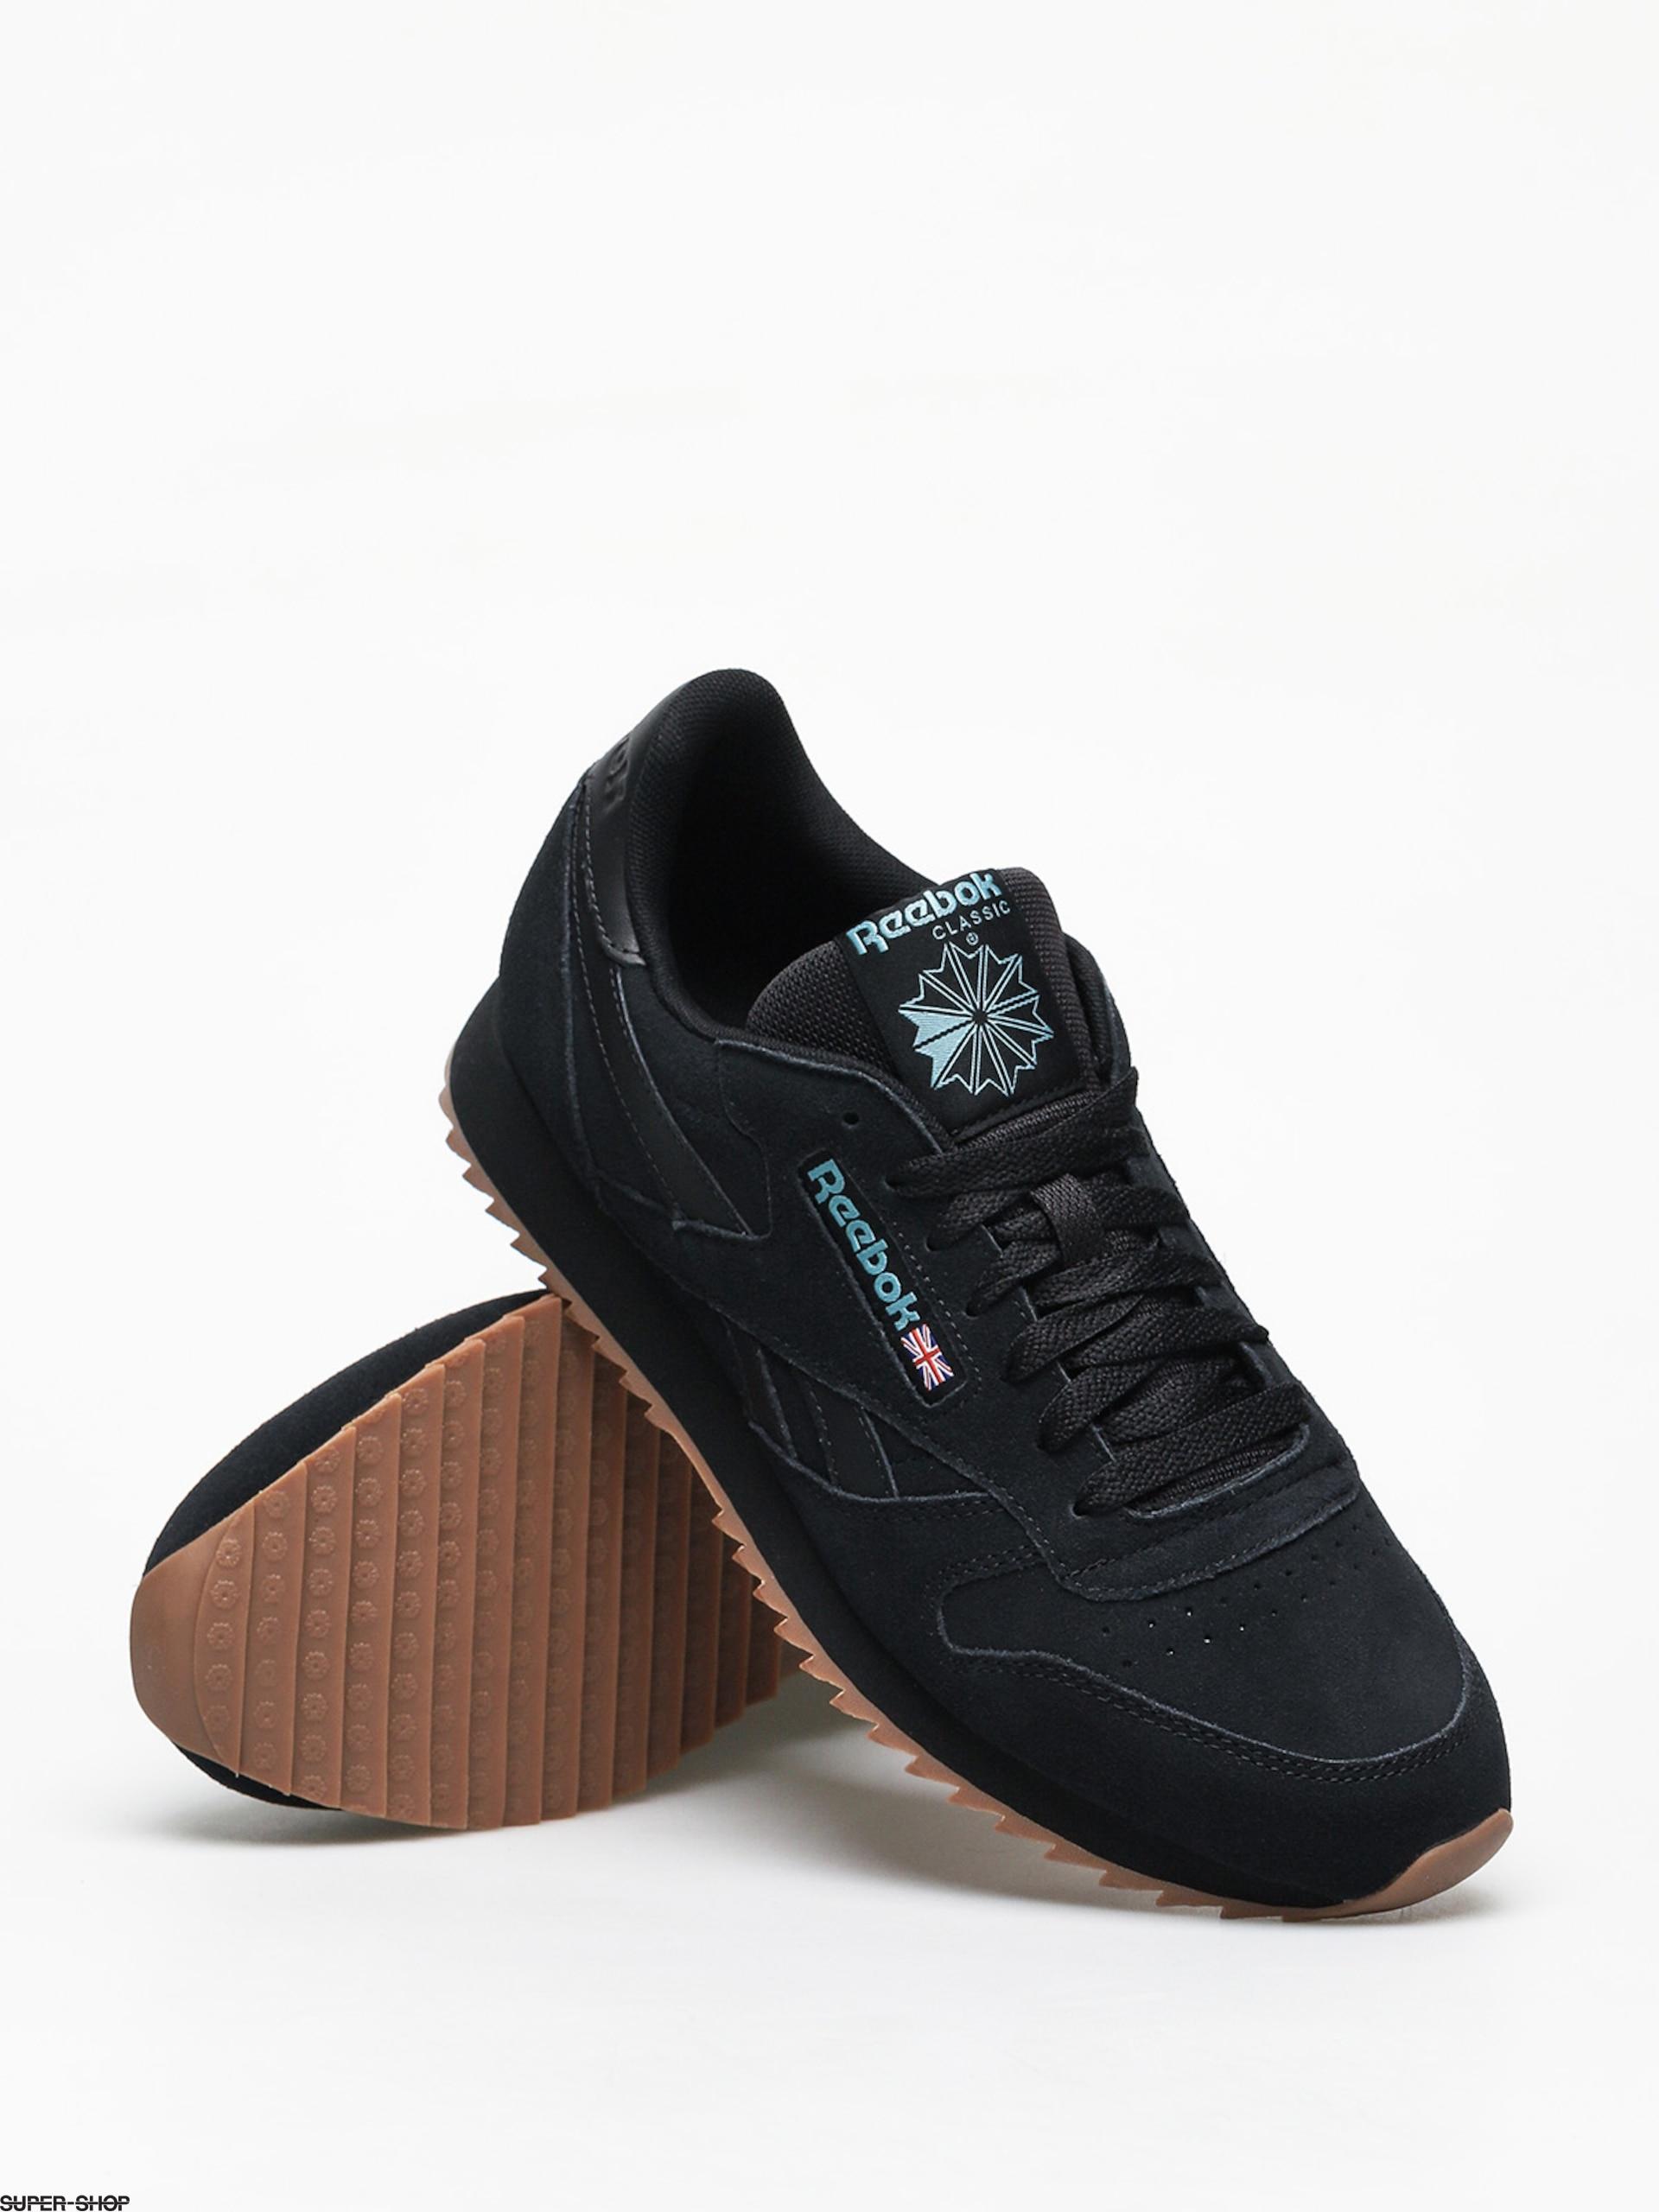 Reebok Cl Leather Mu Shoes (black